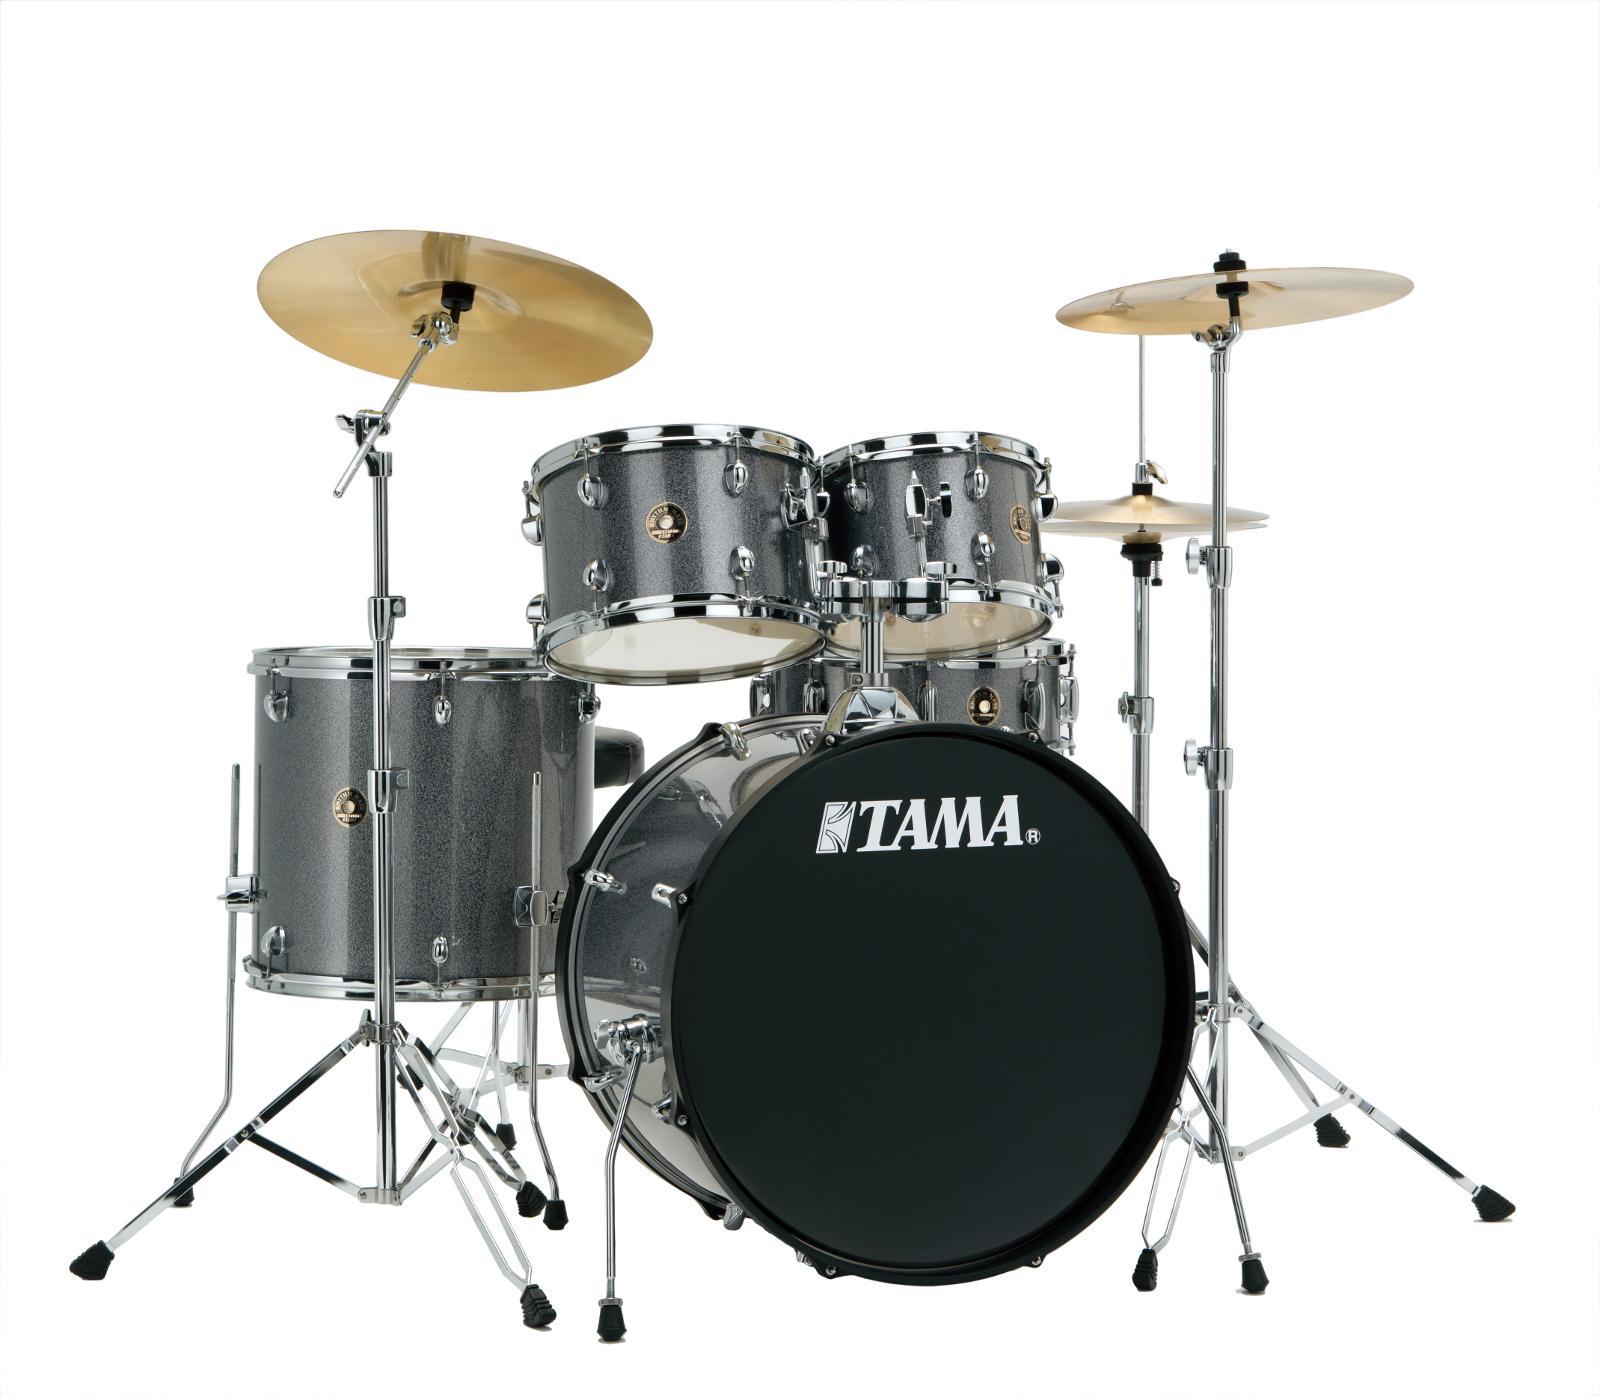 Billede af Tama Rhythm Mate Standard Trommesæt Galaxy Silver